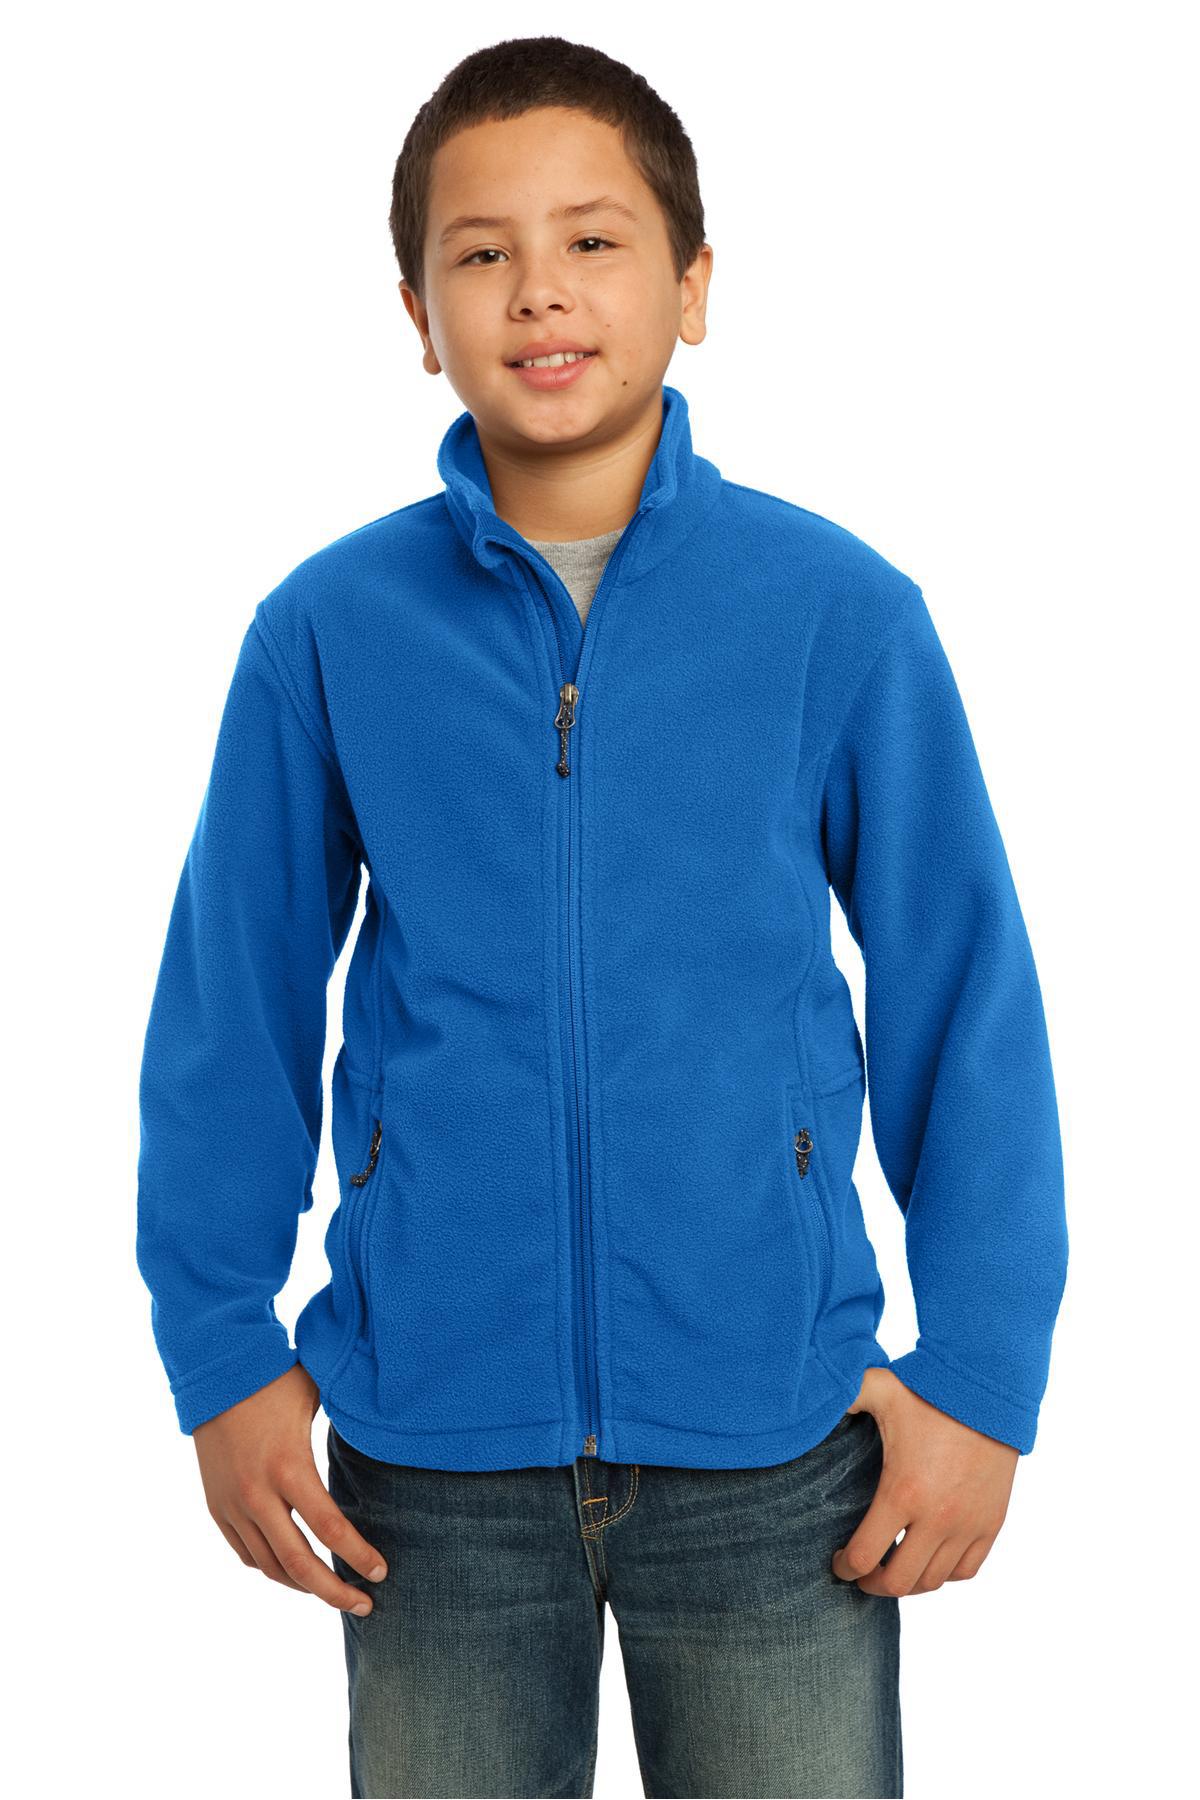 Port Authority Youth Value Fleece Jacket Y217 Iron Grey XL